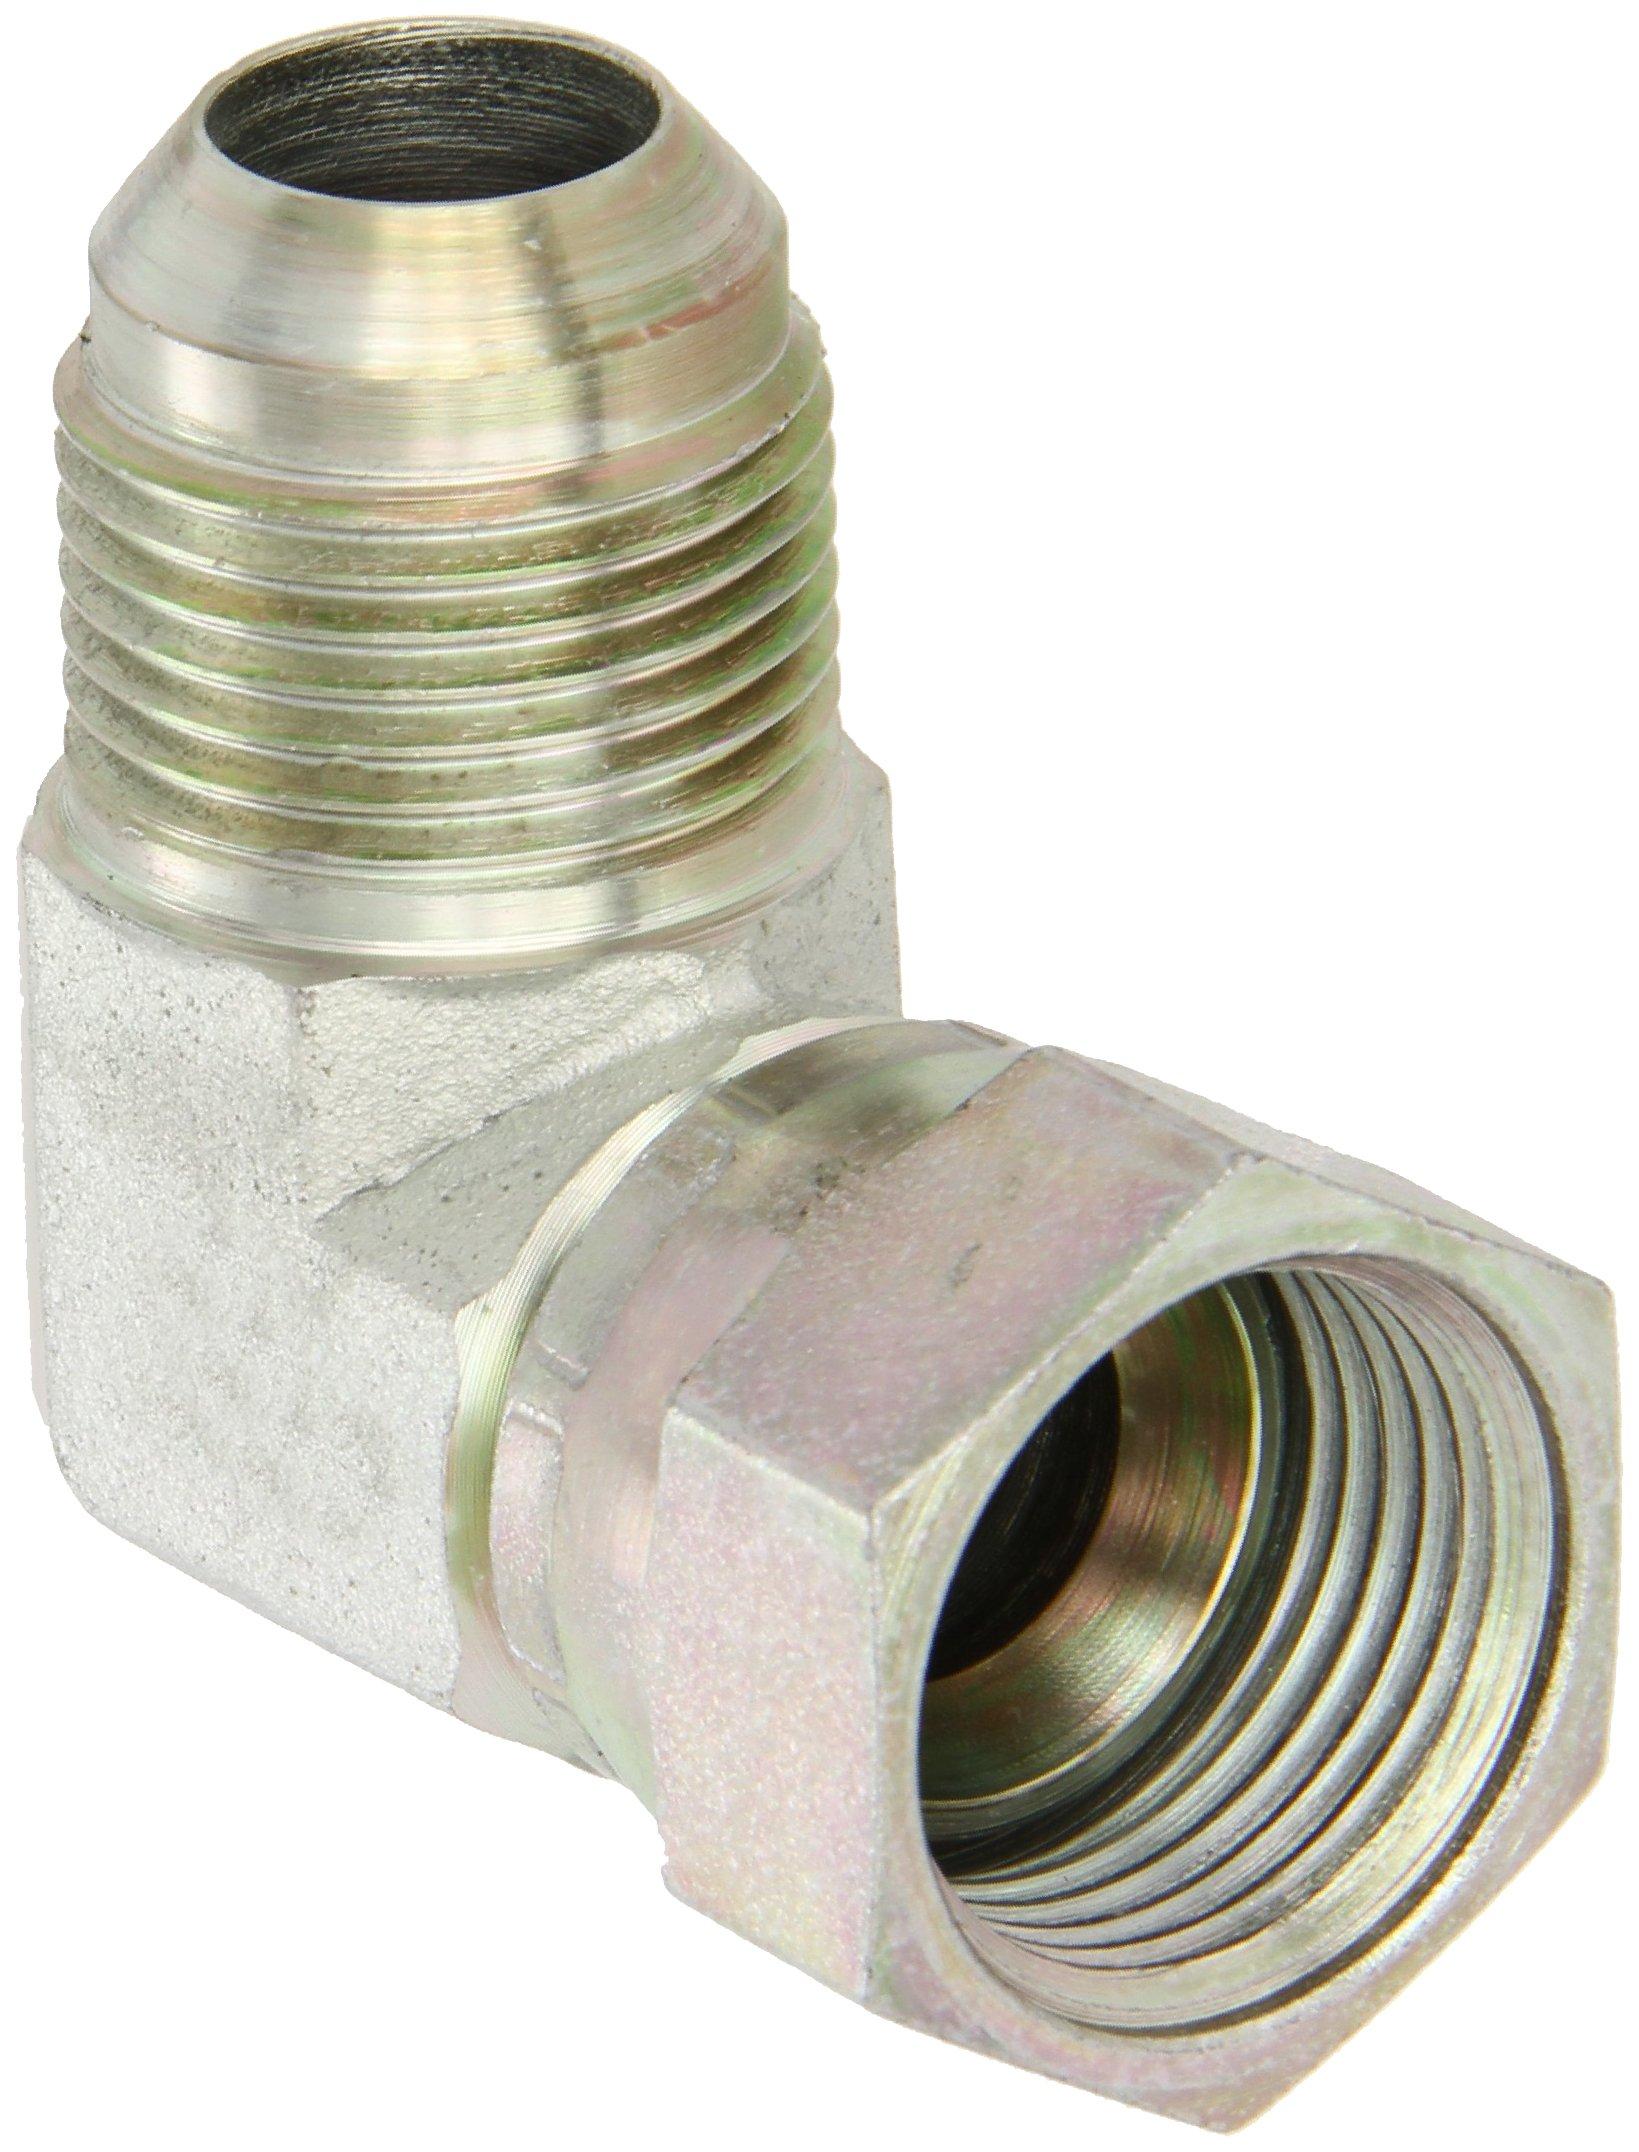 Eaton Aeroquip 2071-12-12S 90 Degree Swivel Nut Elbow, JIC 37 Degree End Types, Carbon Steel, 3/4 JIC(f) x 3/4 JIC(m) End Size, 3/4'' Tube OD by Aeroquip